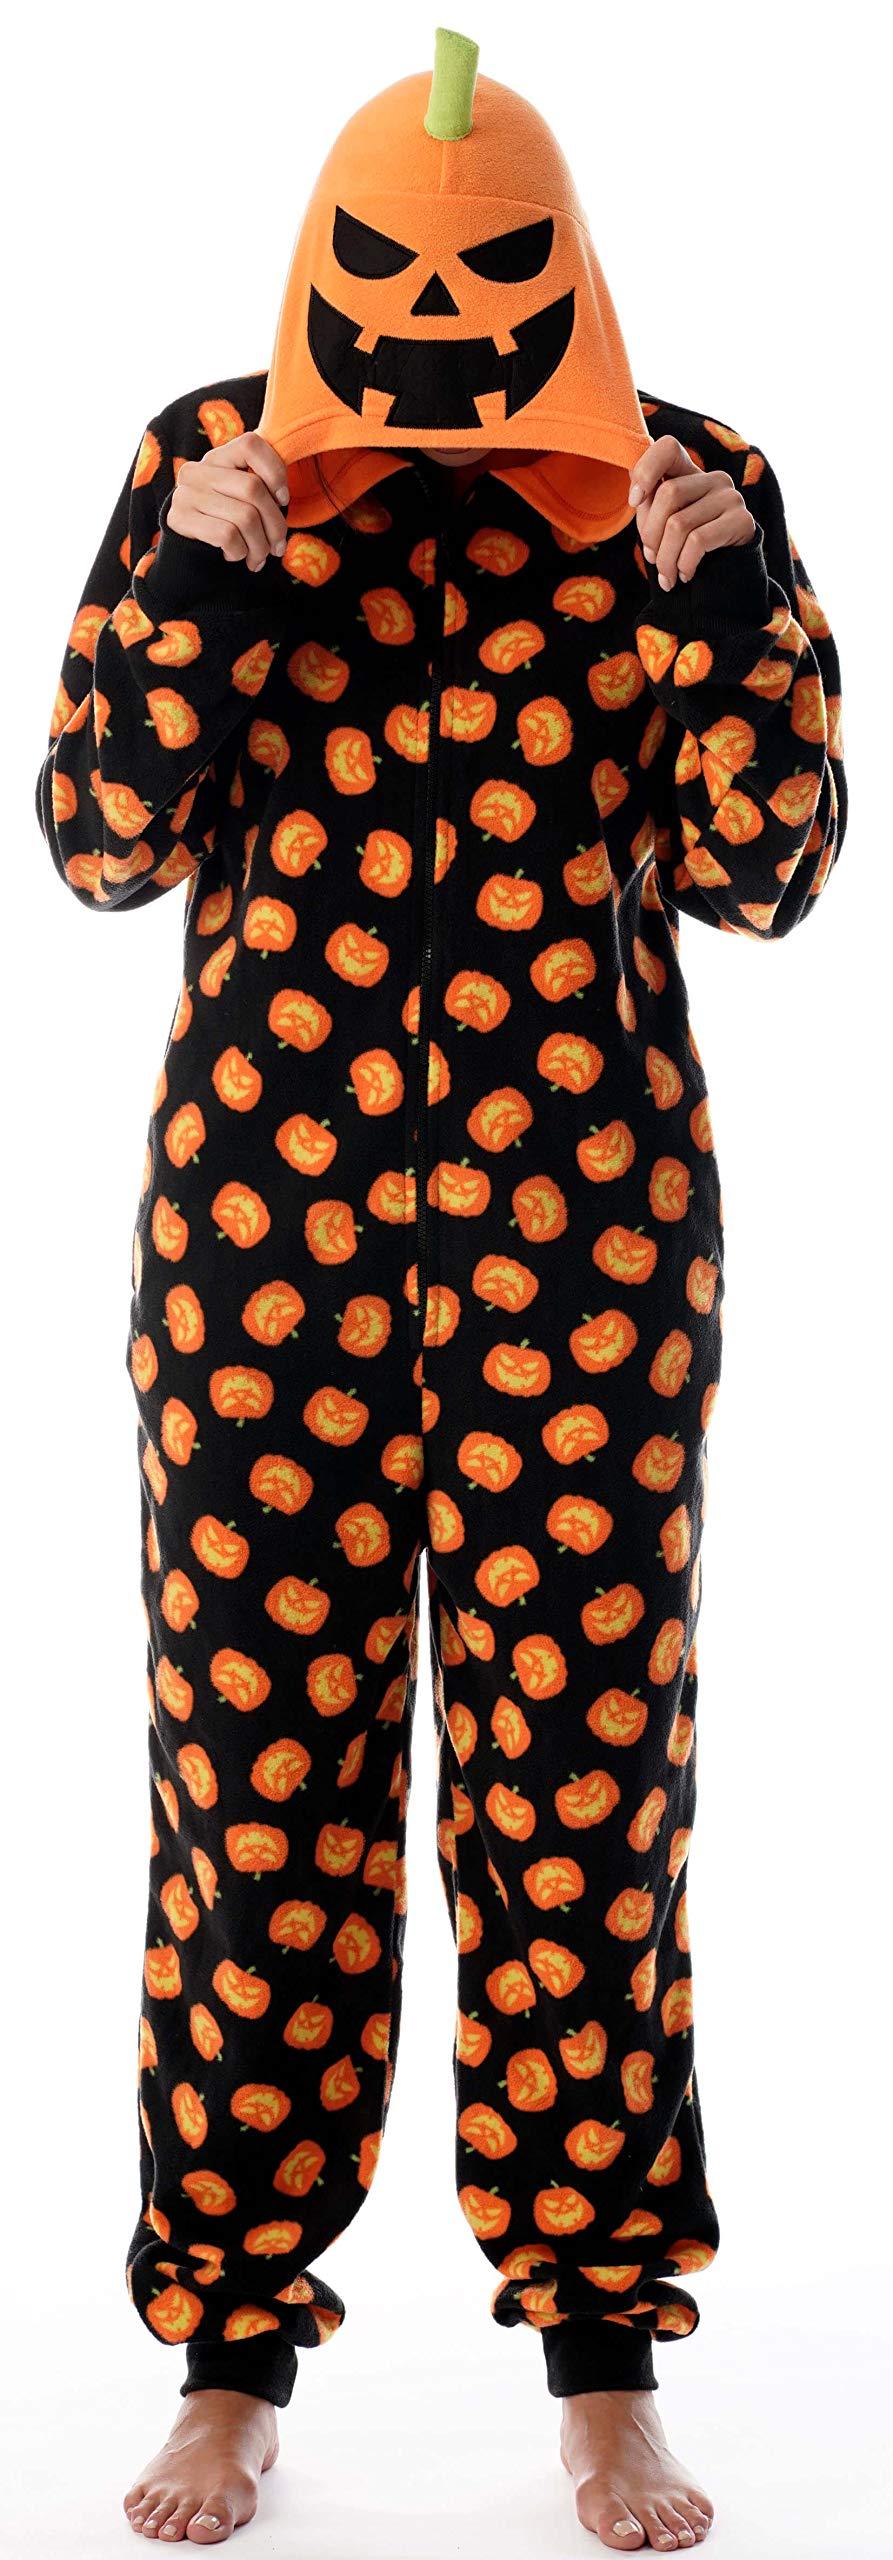 b8a4b9a6c7 Best Rated in Women s Costume Bodysuits   Helpful Customer Reviews ...